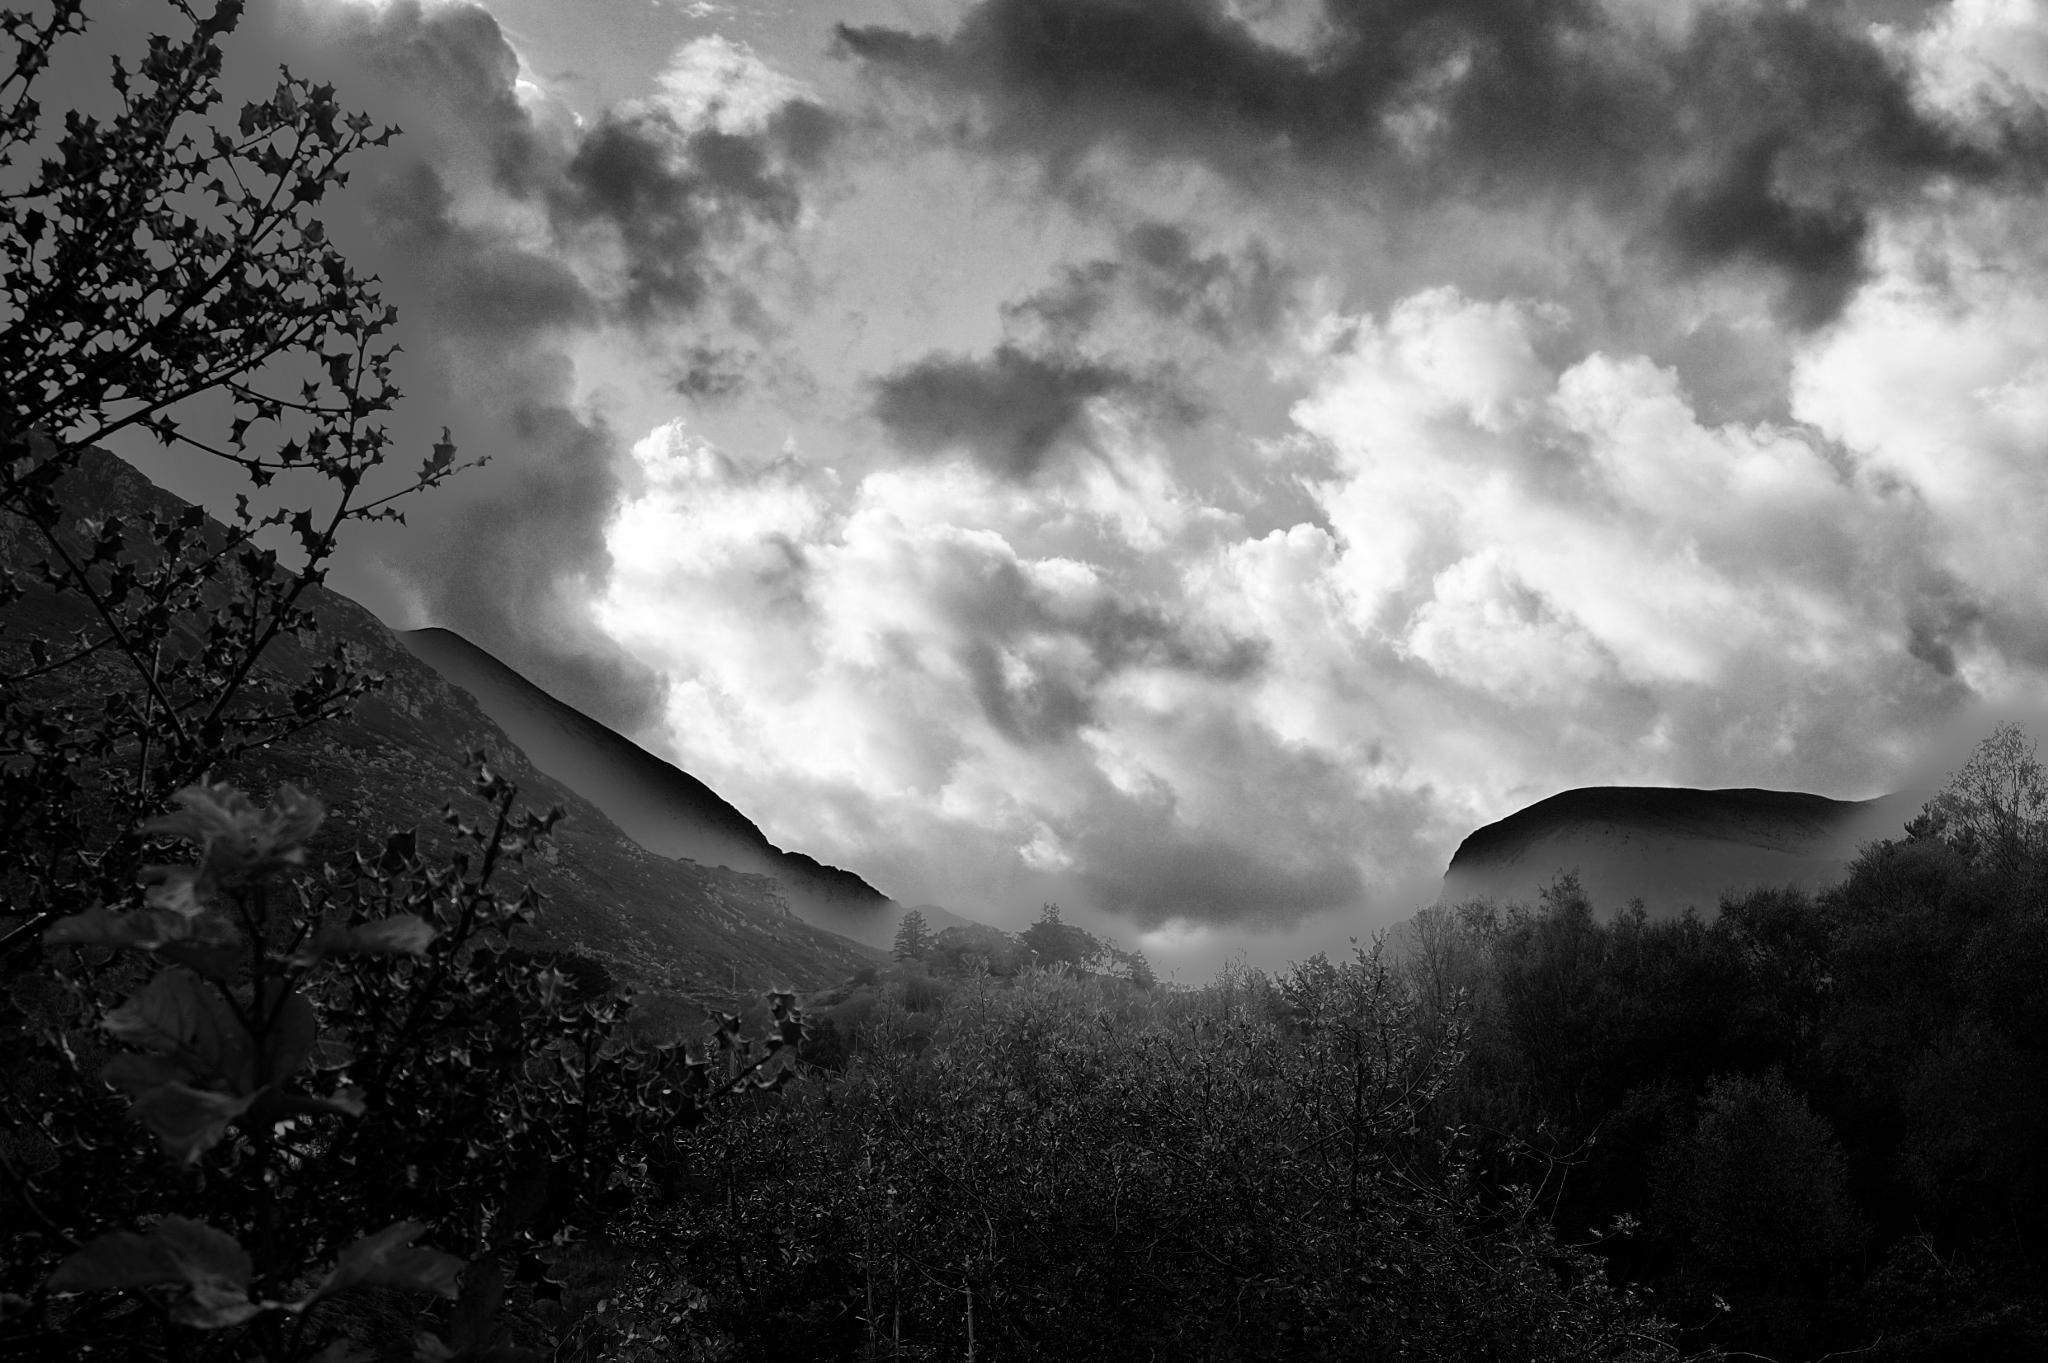 Gap of Dunloe by David Foster